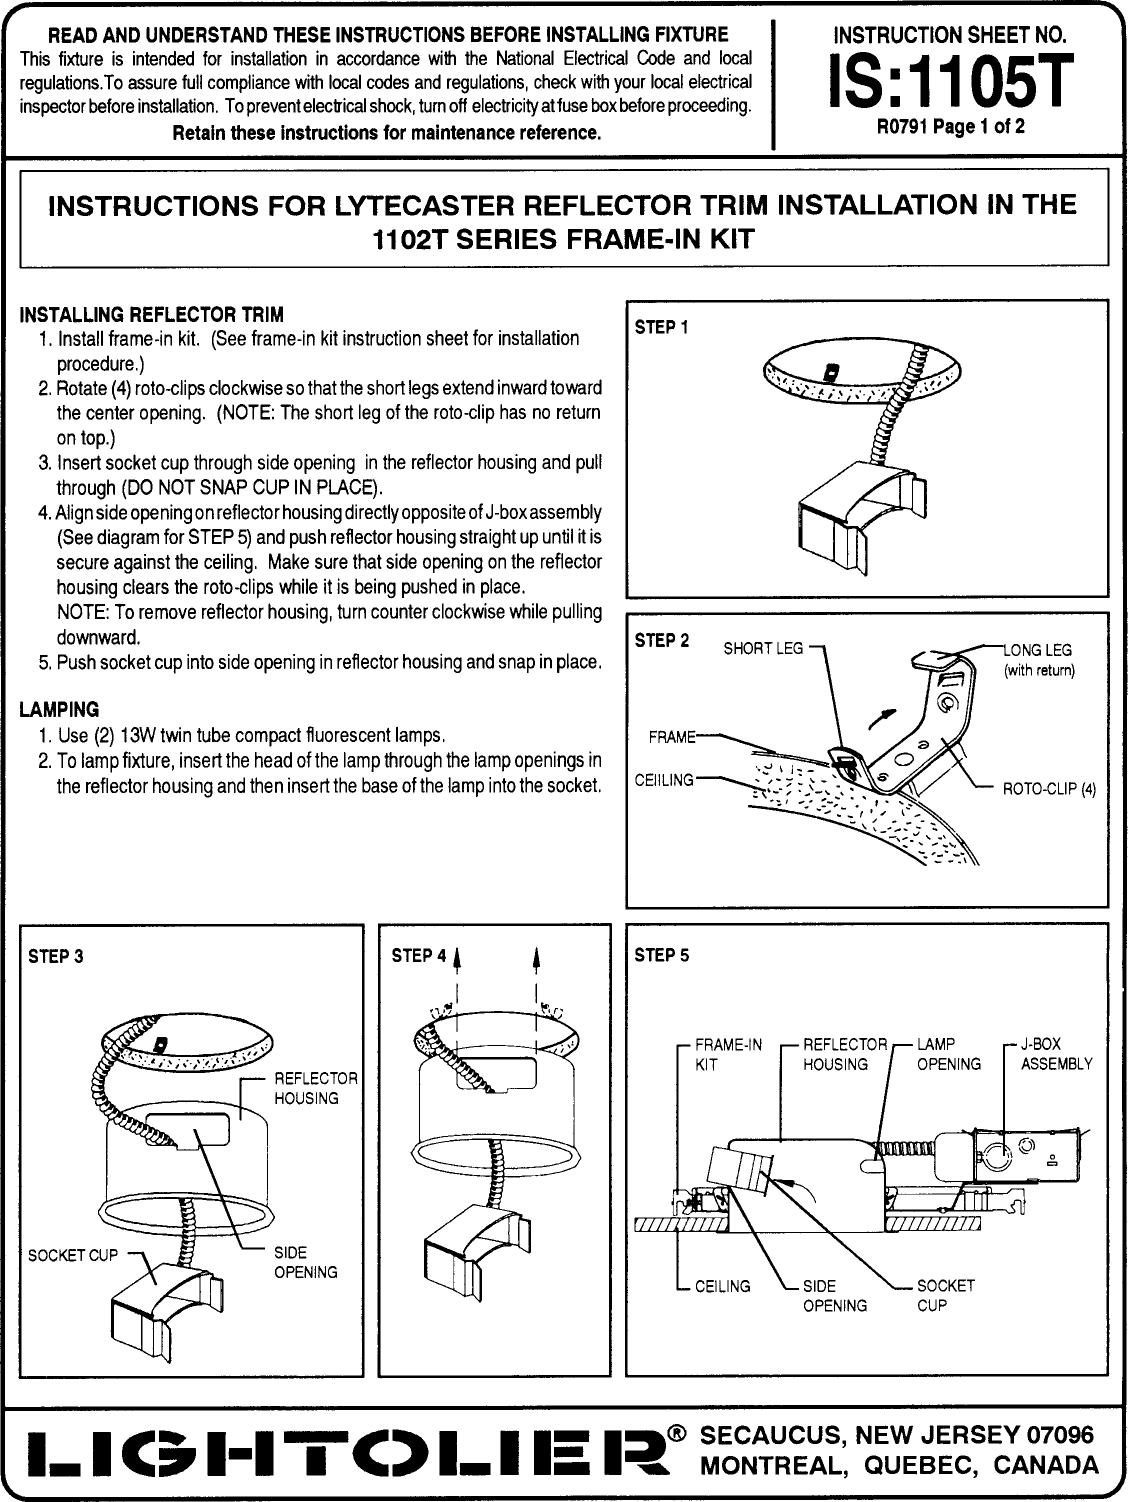 Lightolier Lytecaster Recessed Downlighting 1105t Users Manual Fuse Box Cartoon Downlights Instruction Sheets